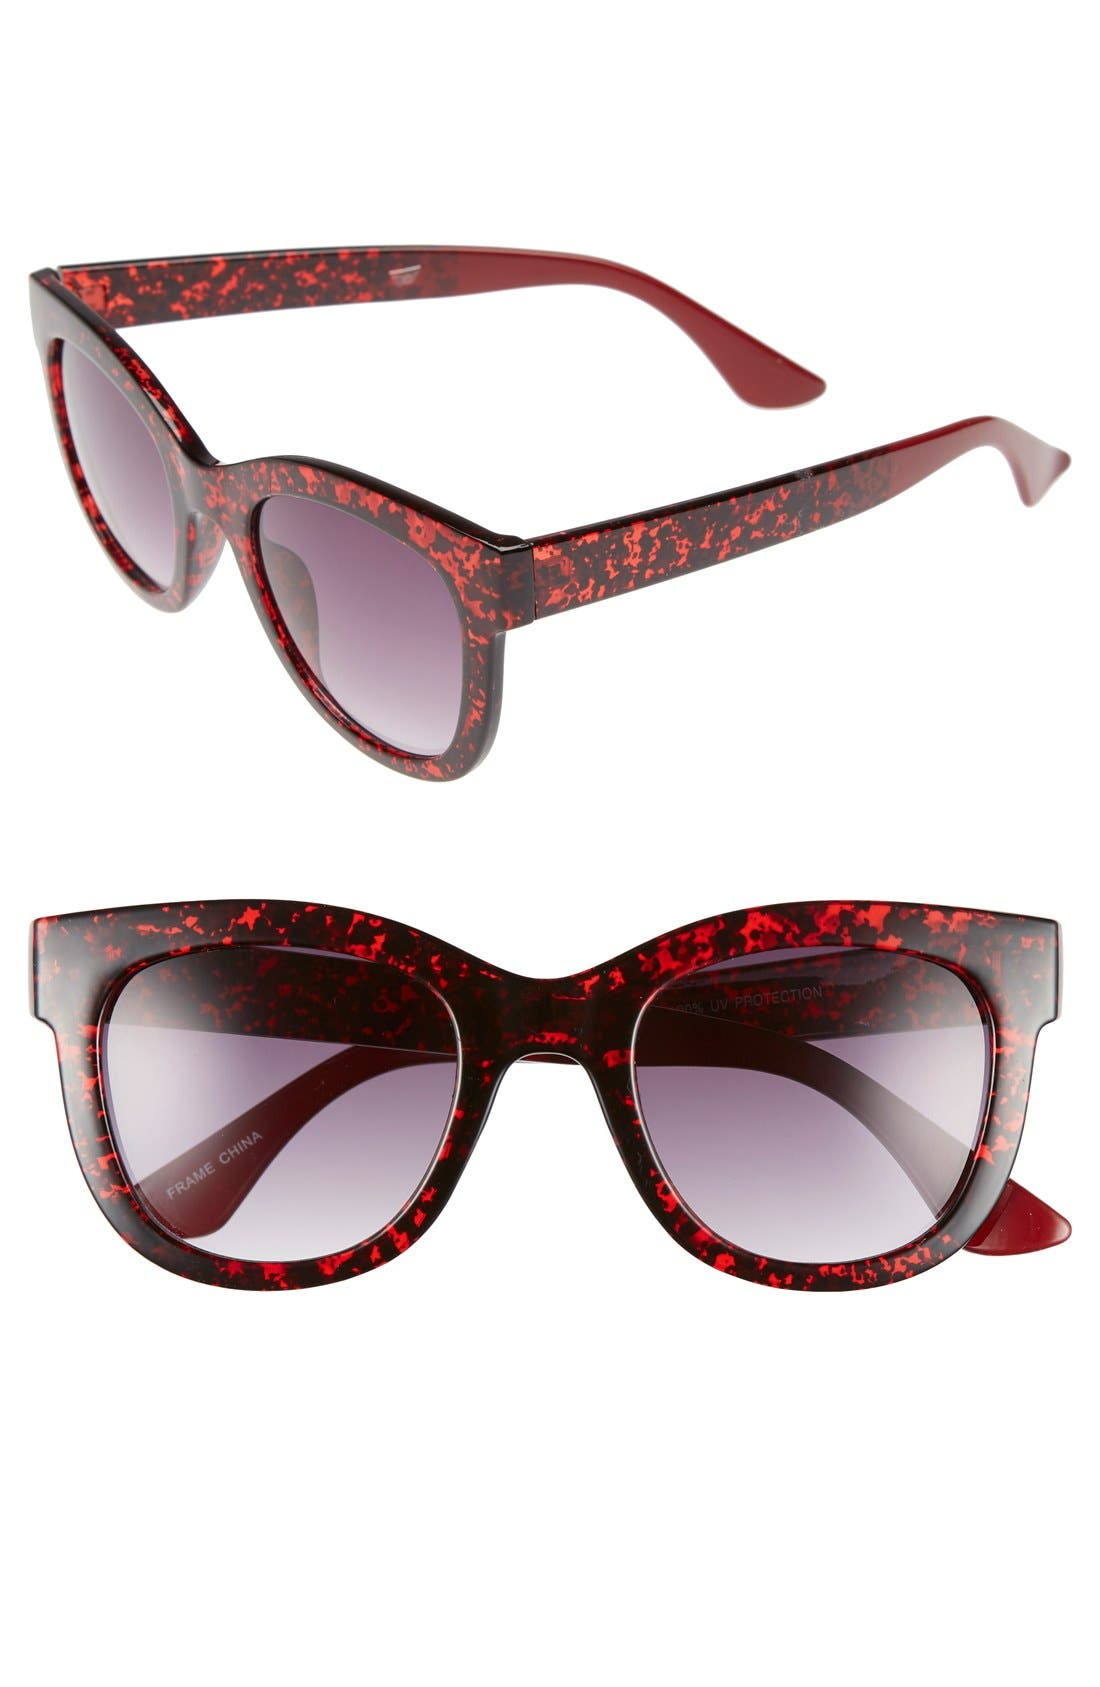 Main Image - Fantas Eyes 50mm Retro Sunglasses